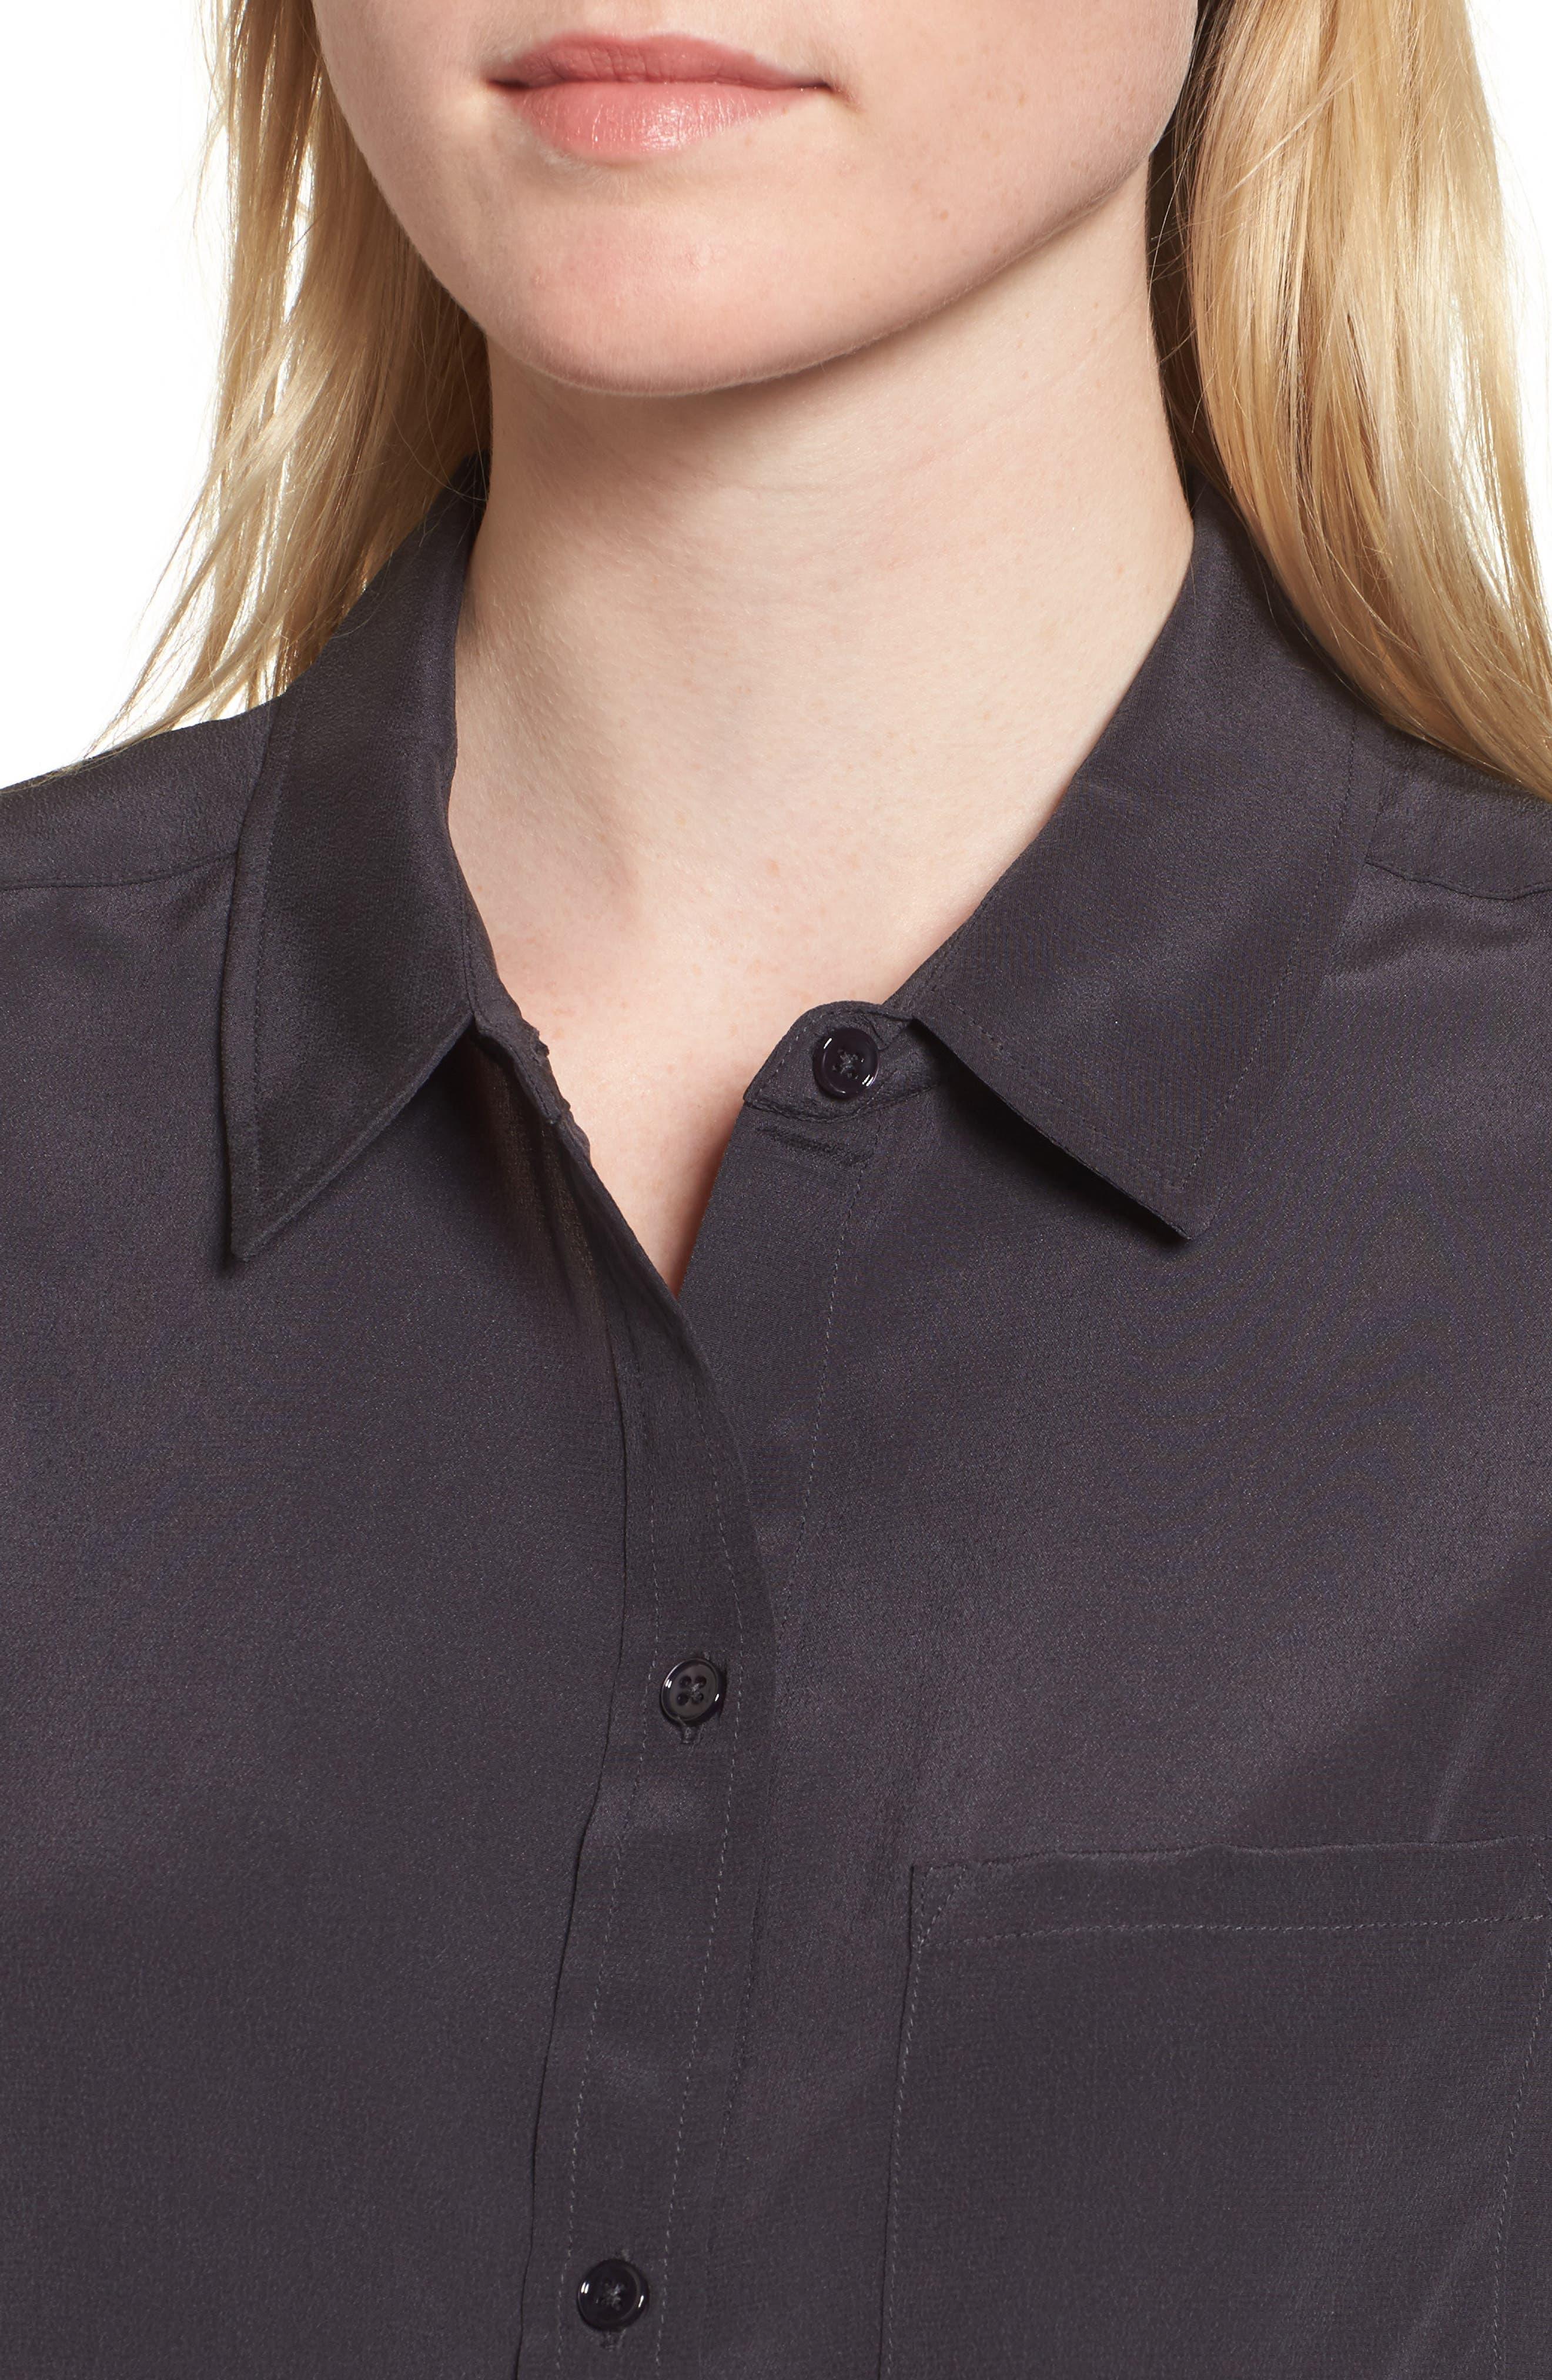 Kate Silk Shirt,                             Alternate thumbnail 4, color,                             Charcoal